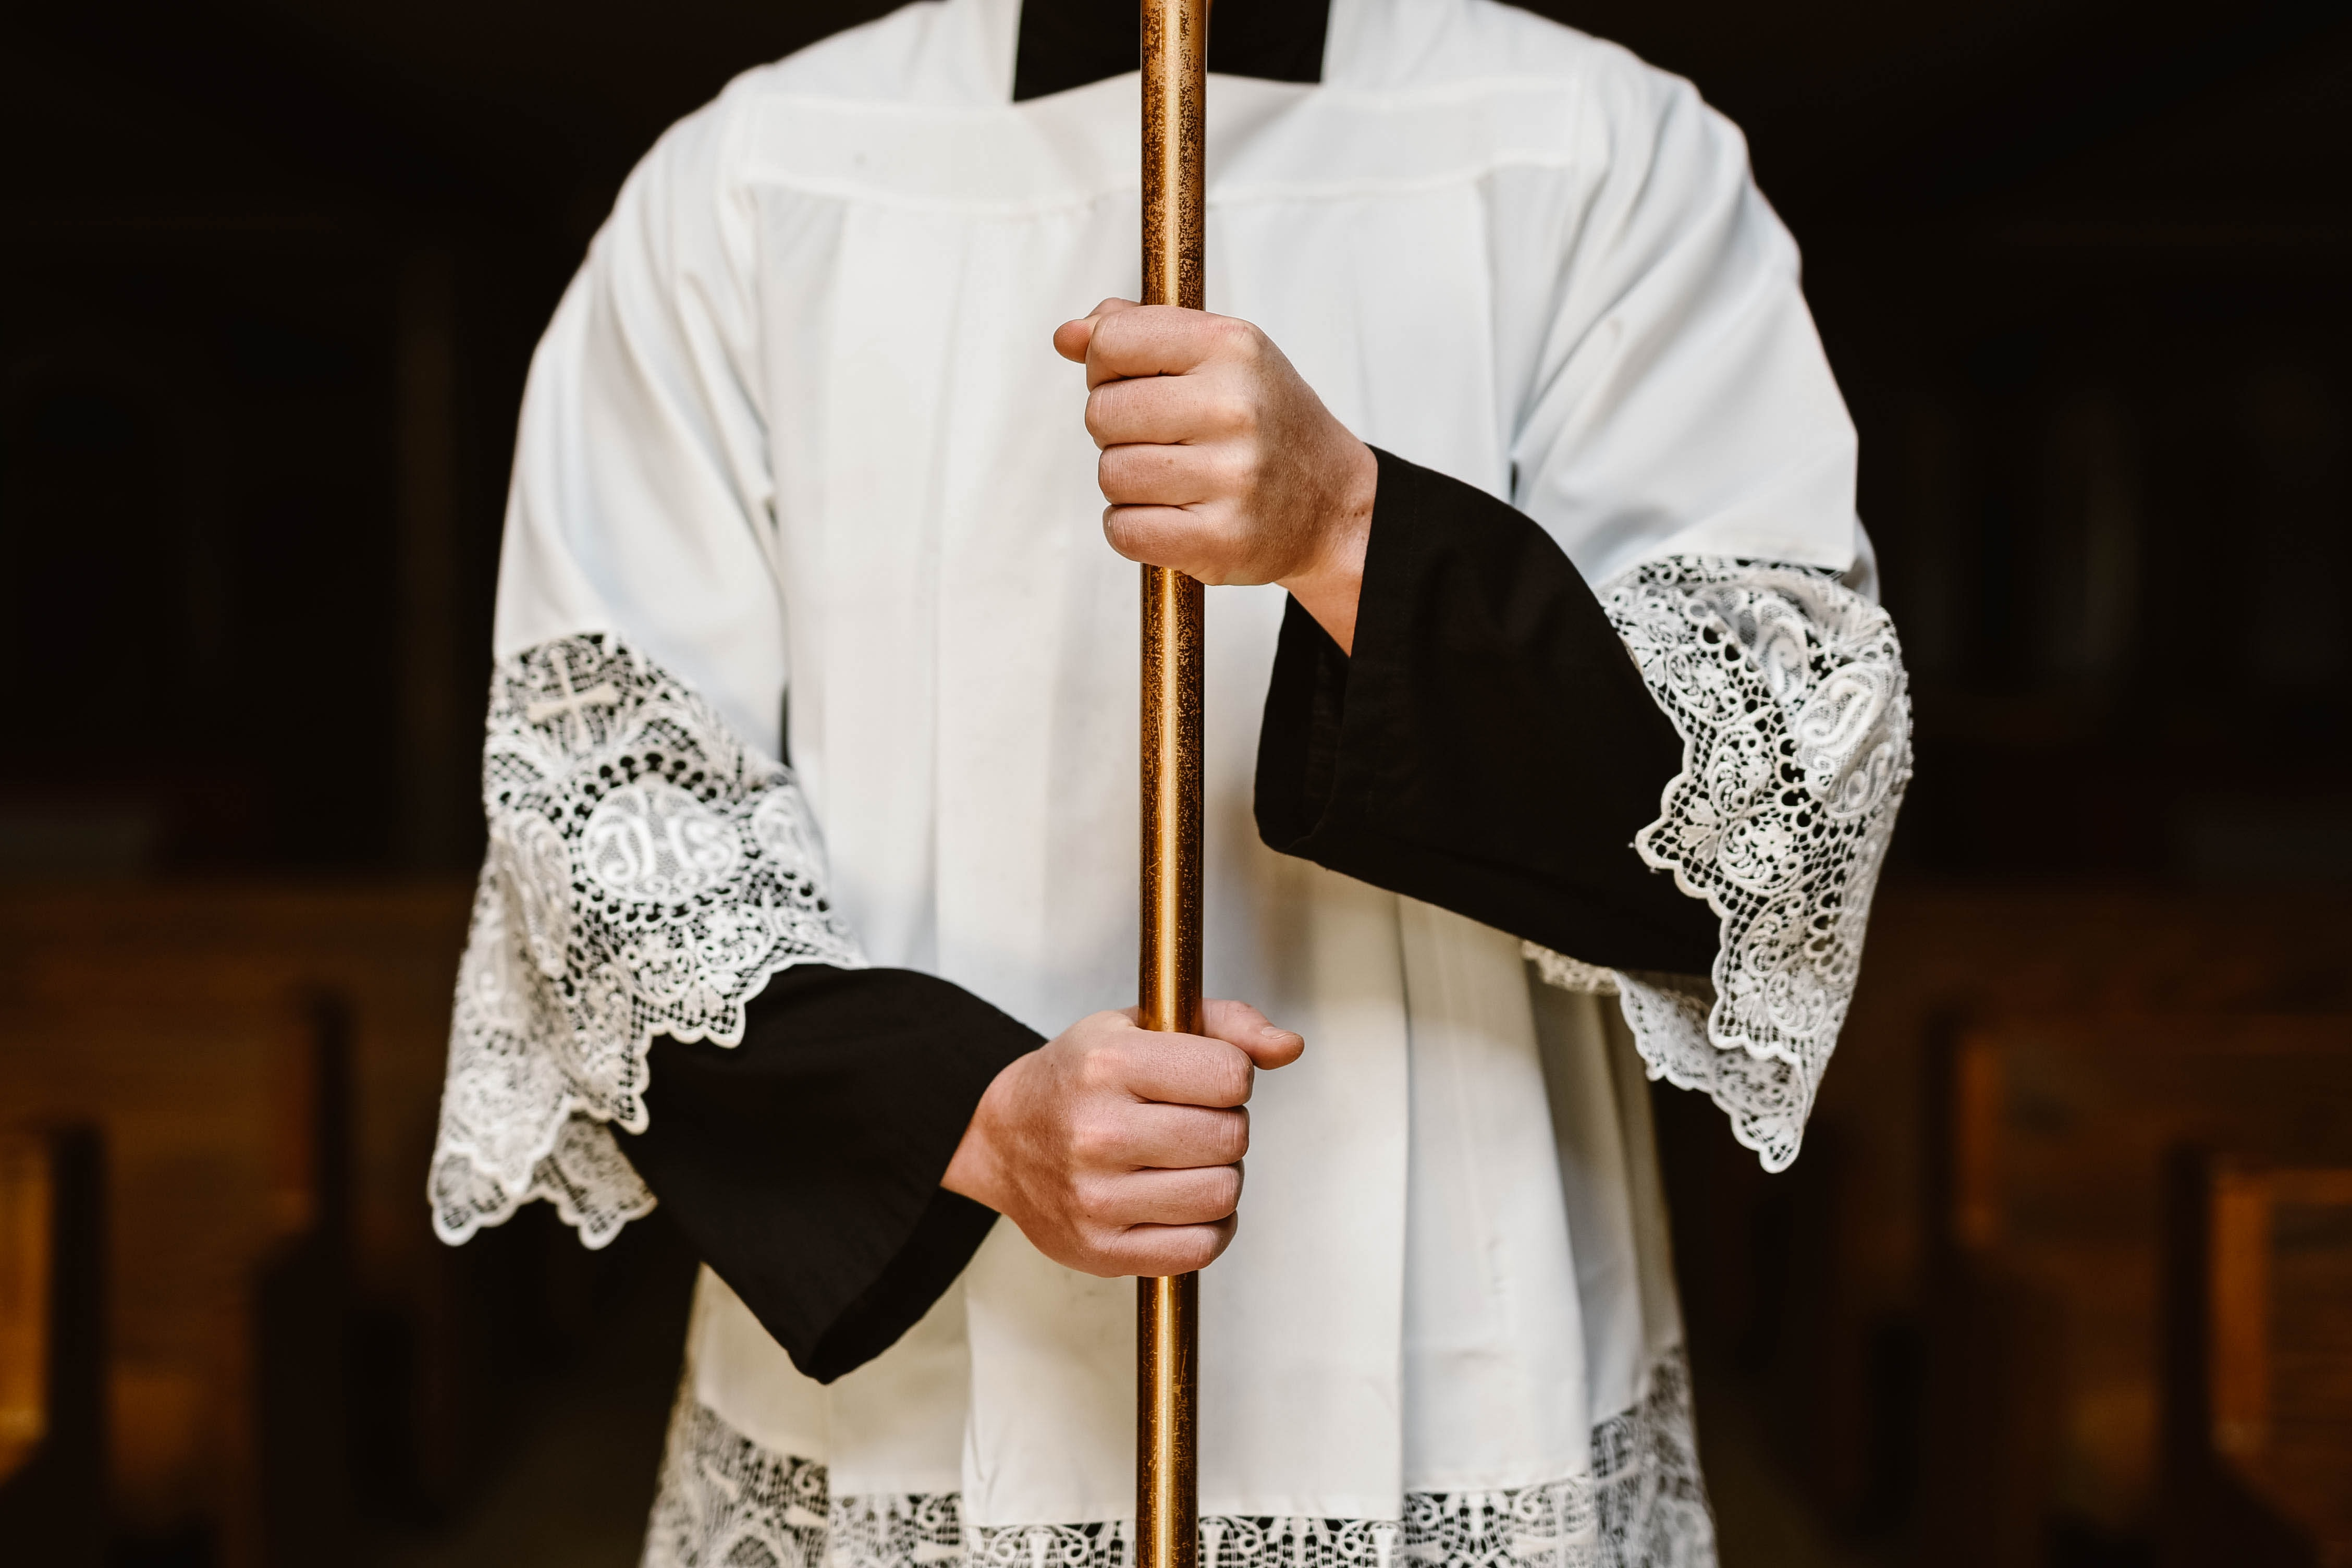 a catholic man holding a staff